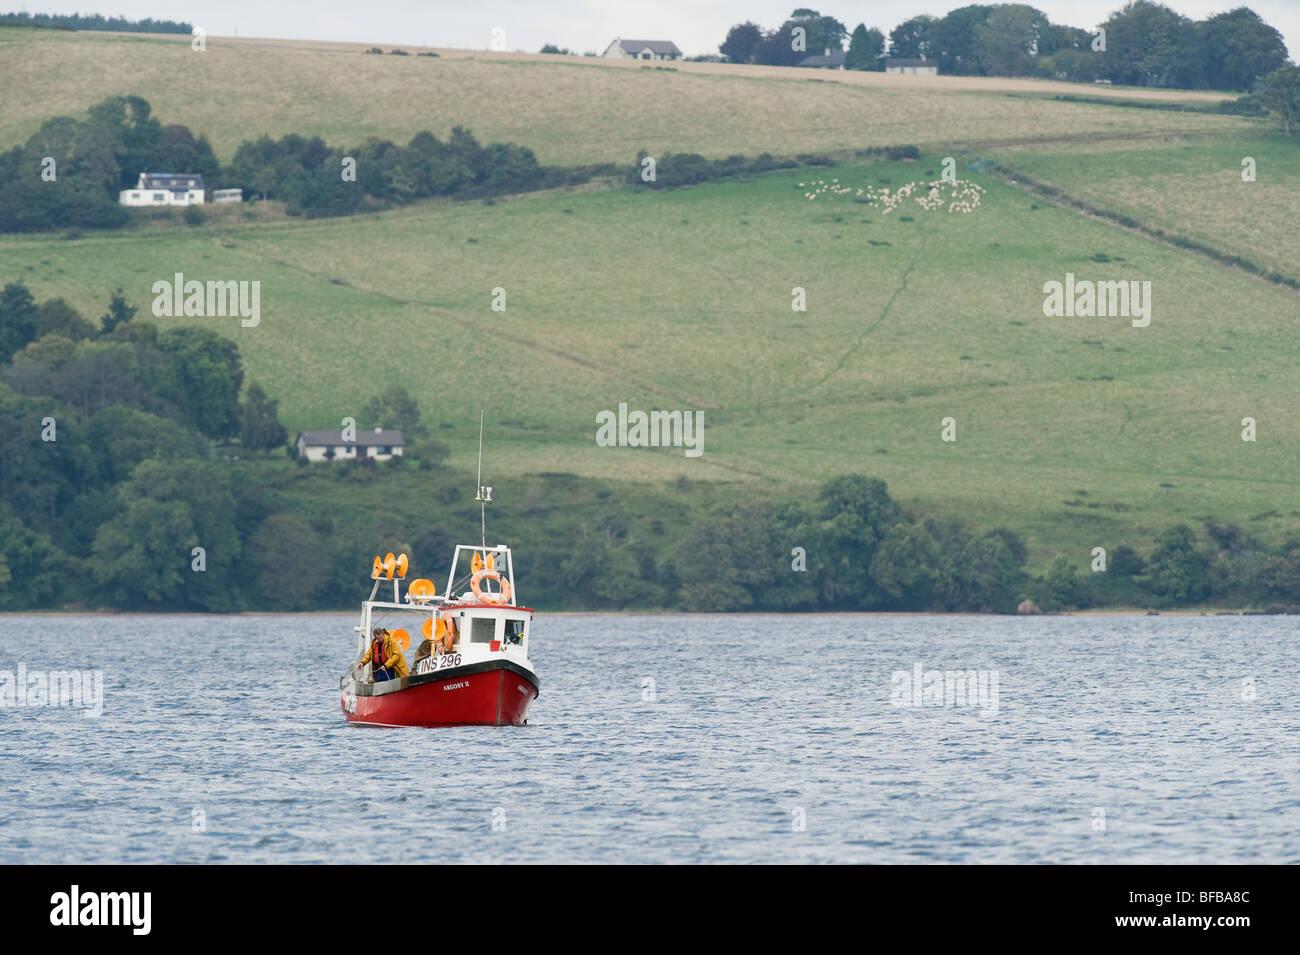 Small fishing boat, Moray Firth, Scotland. Stock Photo